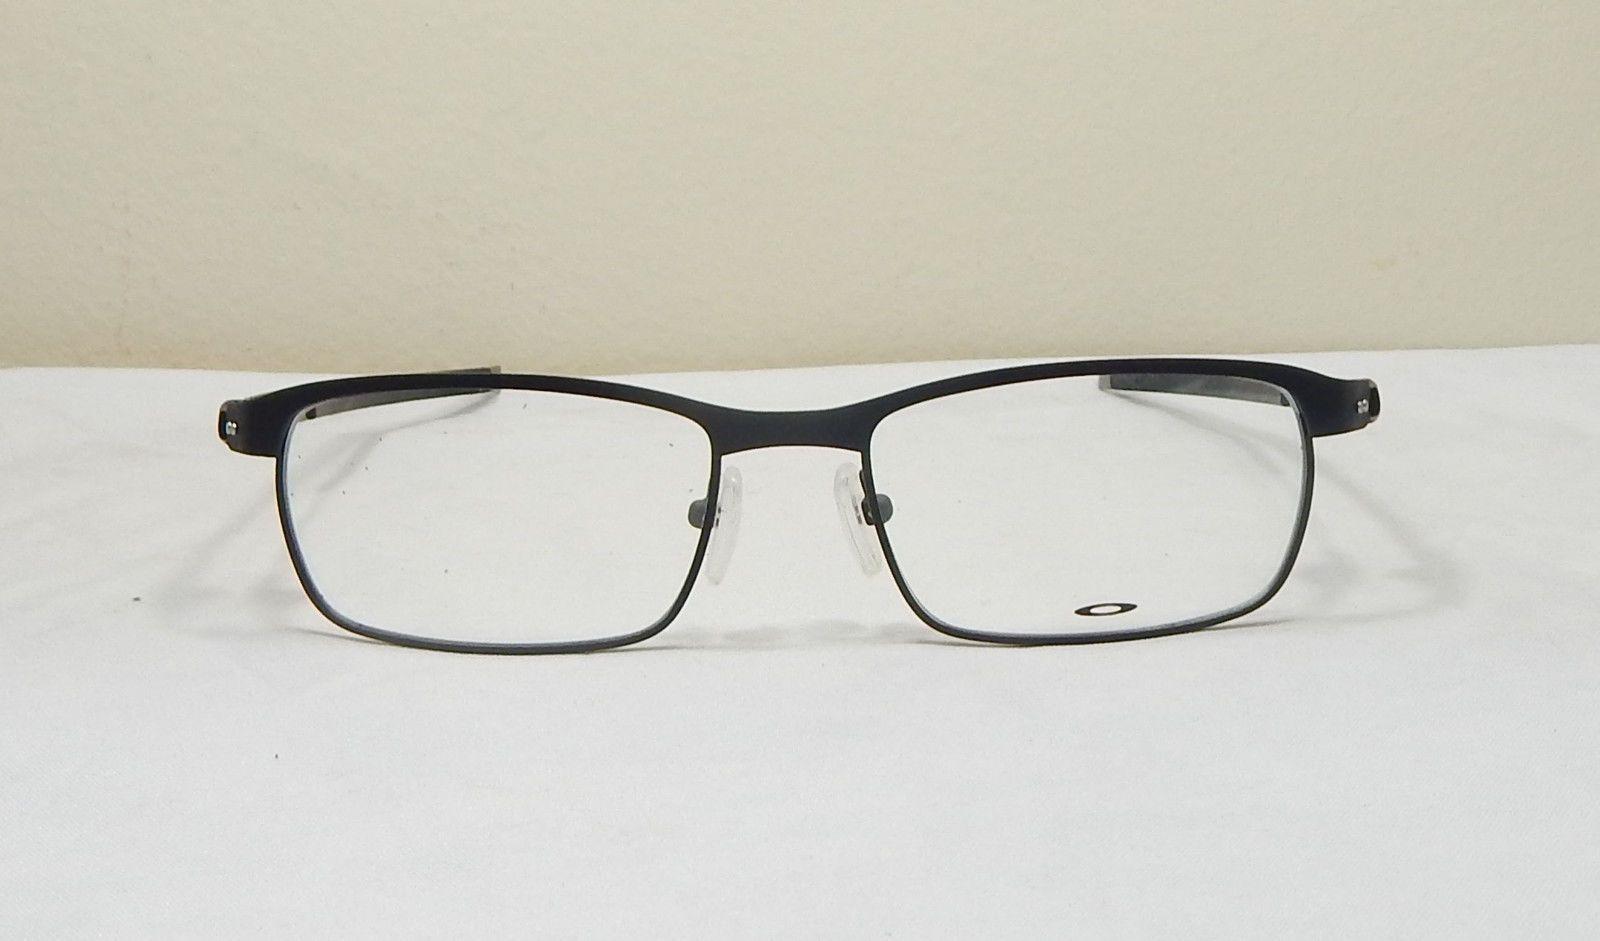 Oakley Men Prescription Eyeglasses Frame: Tincup - Power Coal : 52mm ...